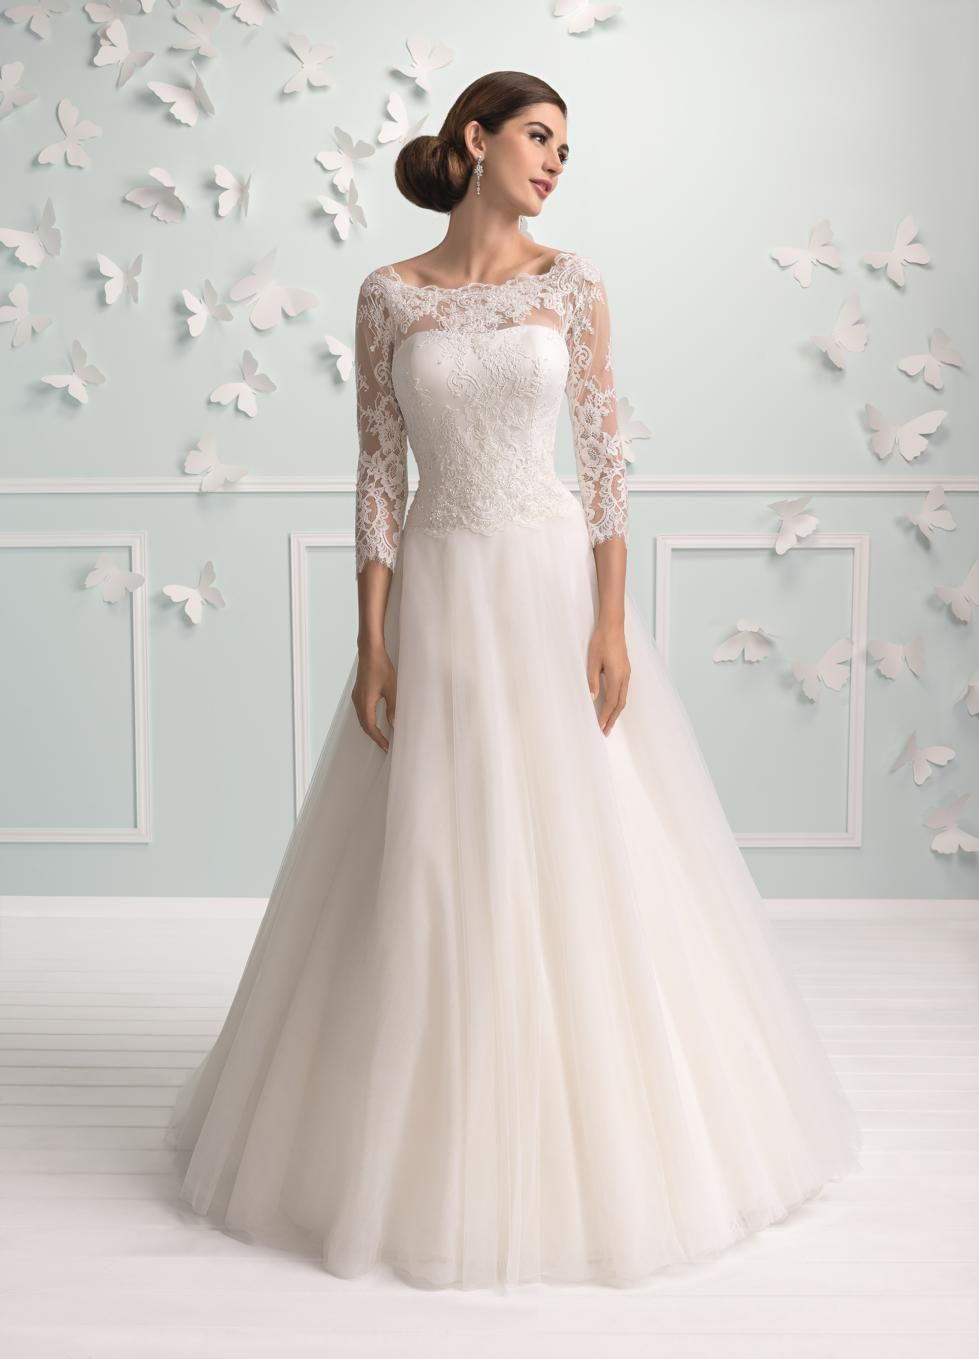 Pin by Corianne van Reenen on Wedding   Wedding dresses, Wedding ...